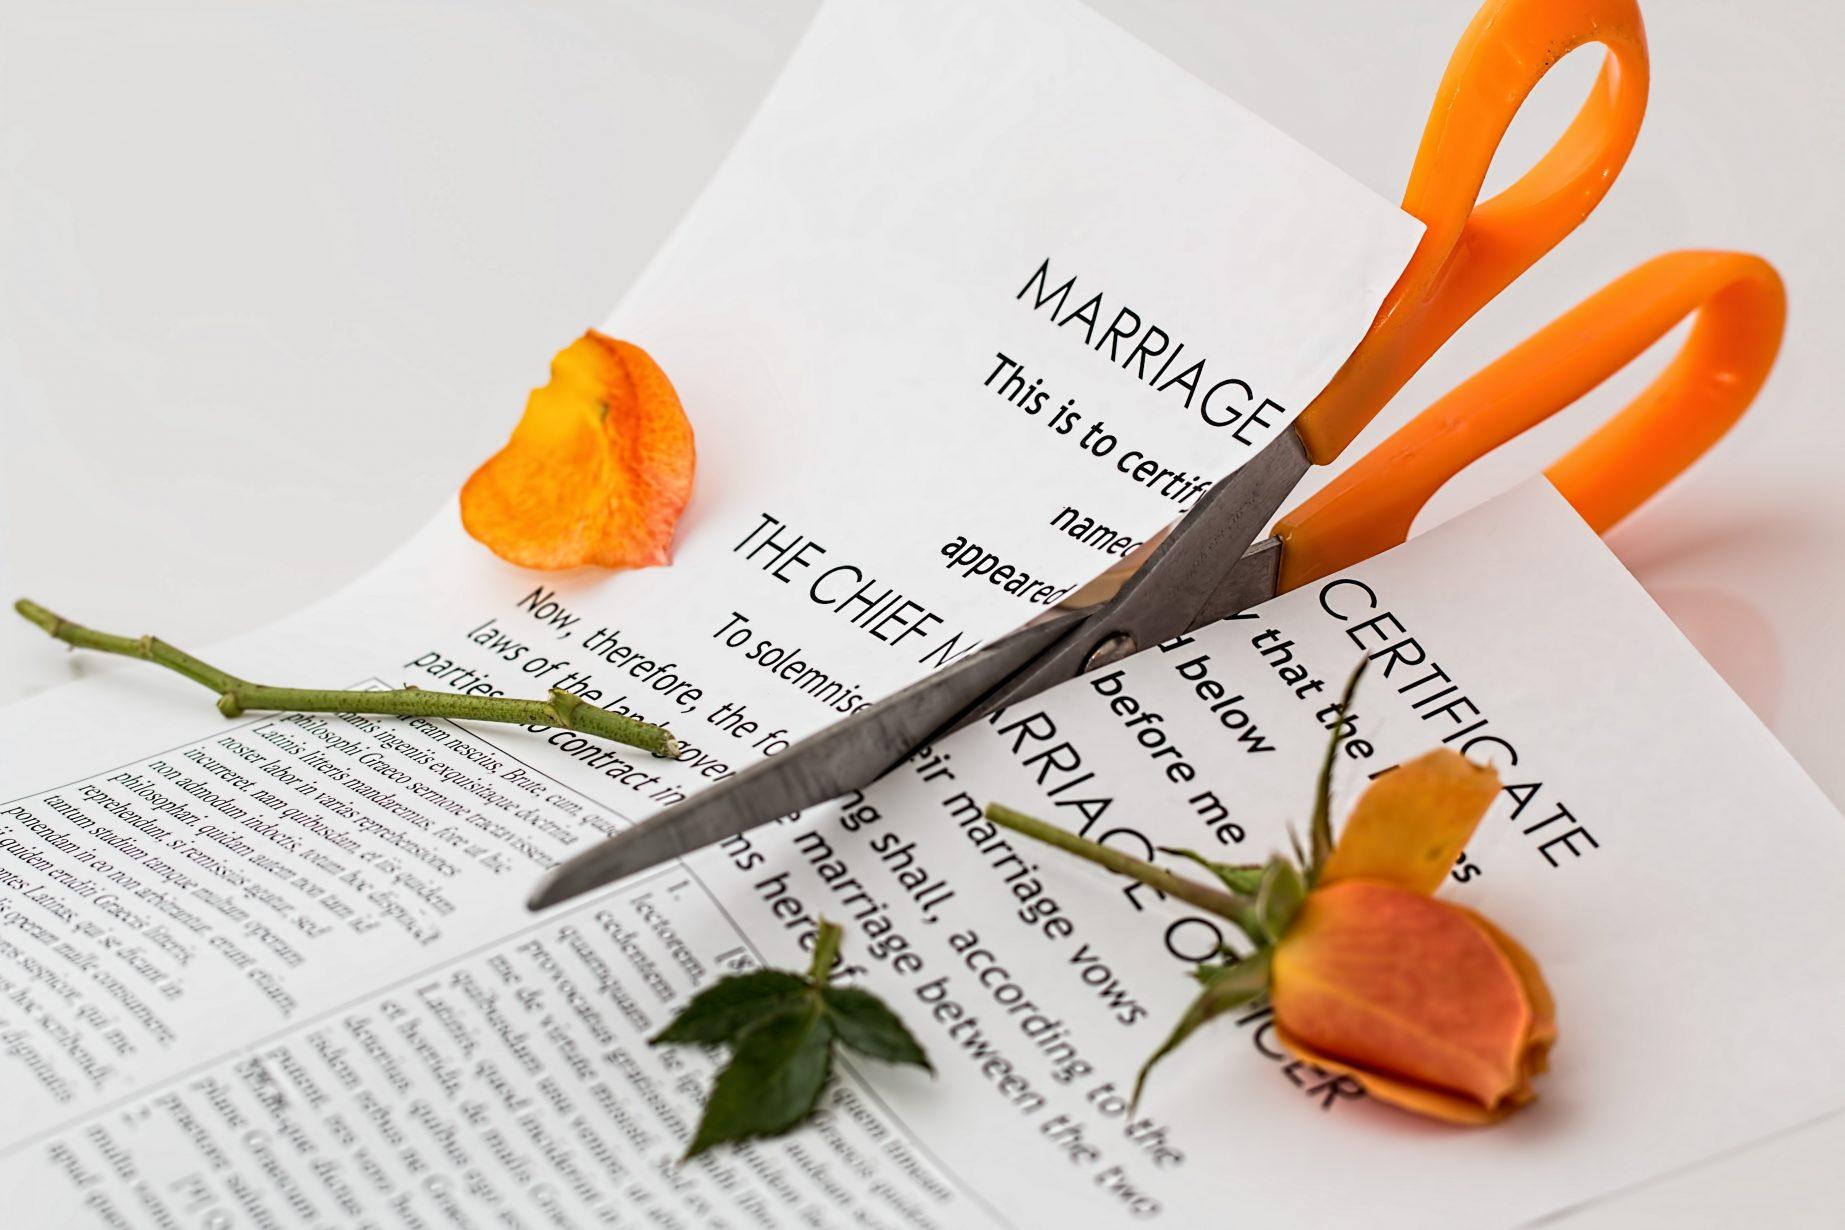 alimony-annulment-break-up-39483